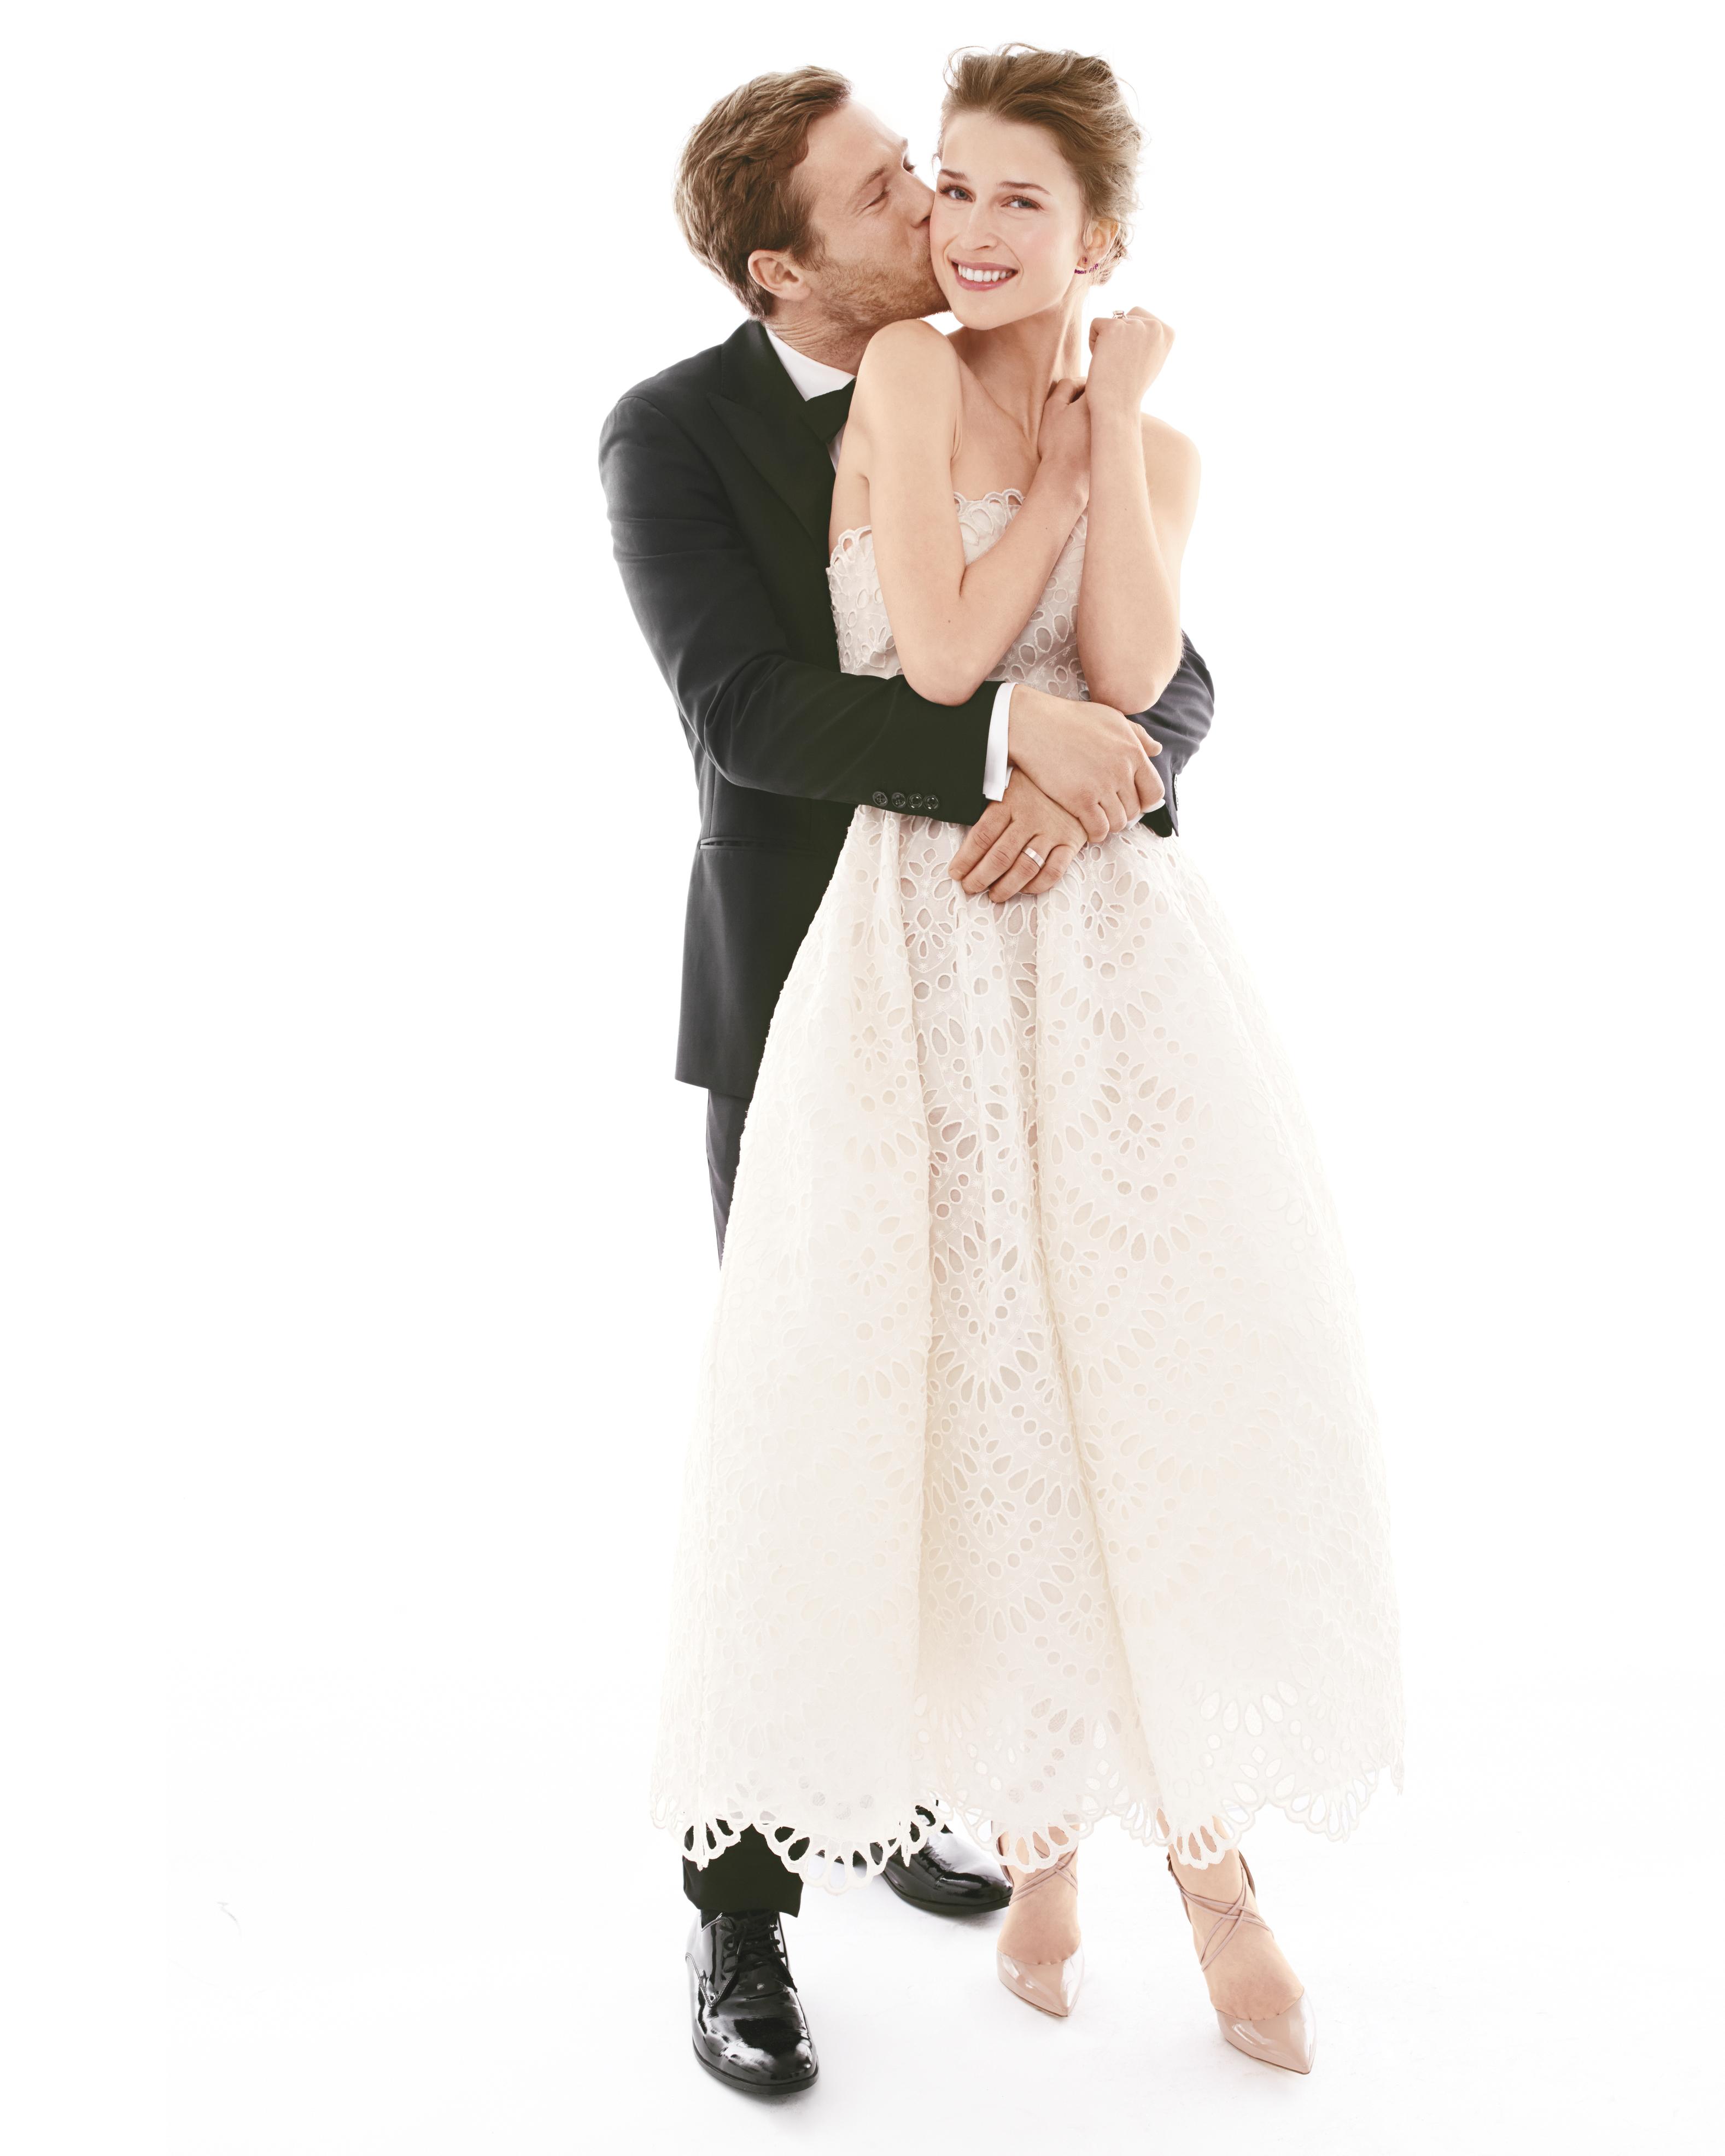 kissing-wedding-dress-001-d111904-comp.jpg